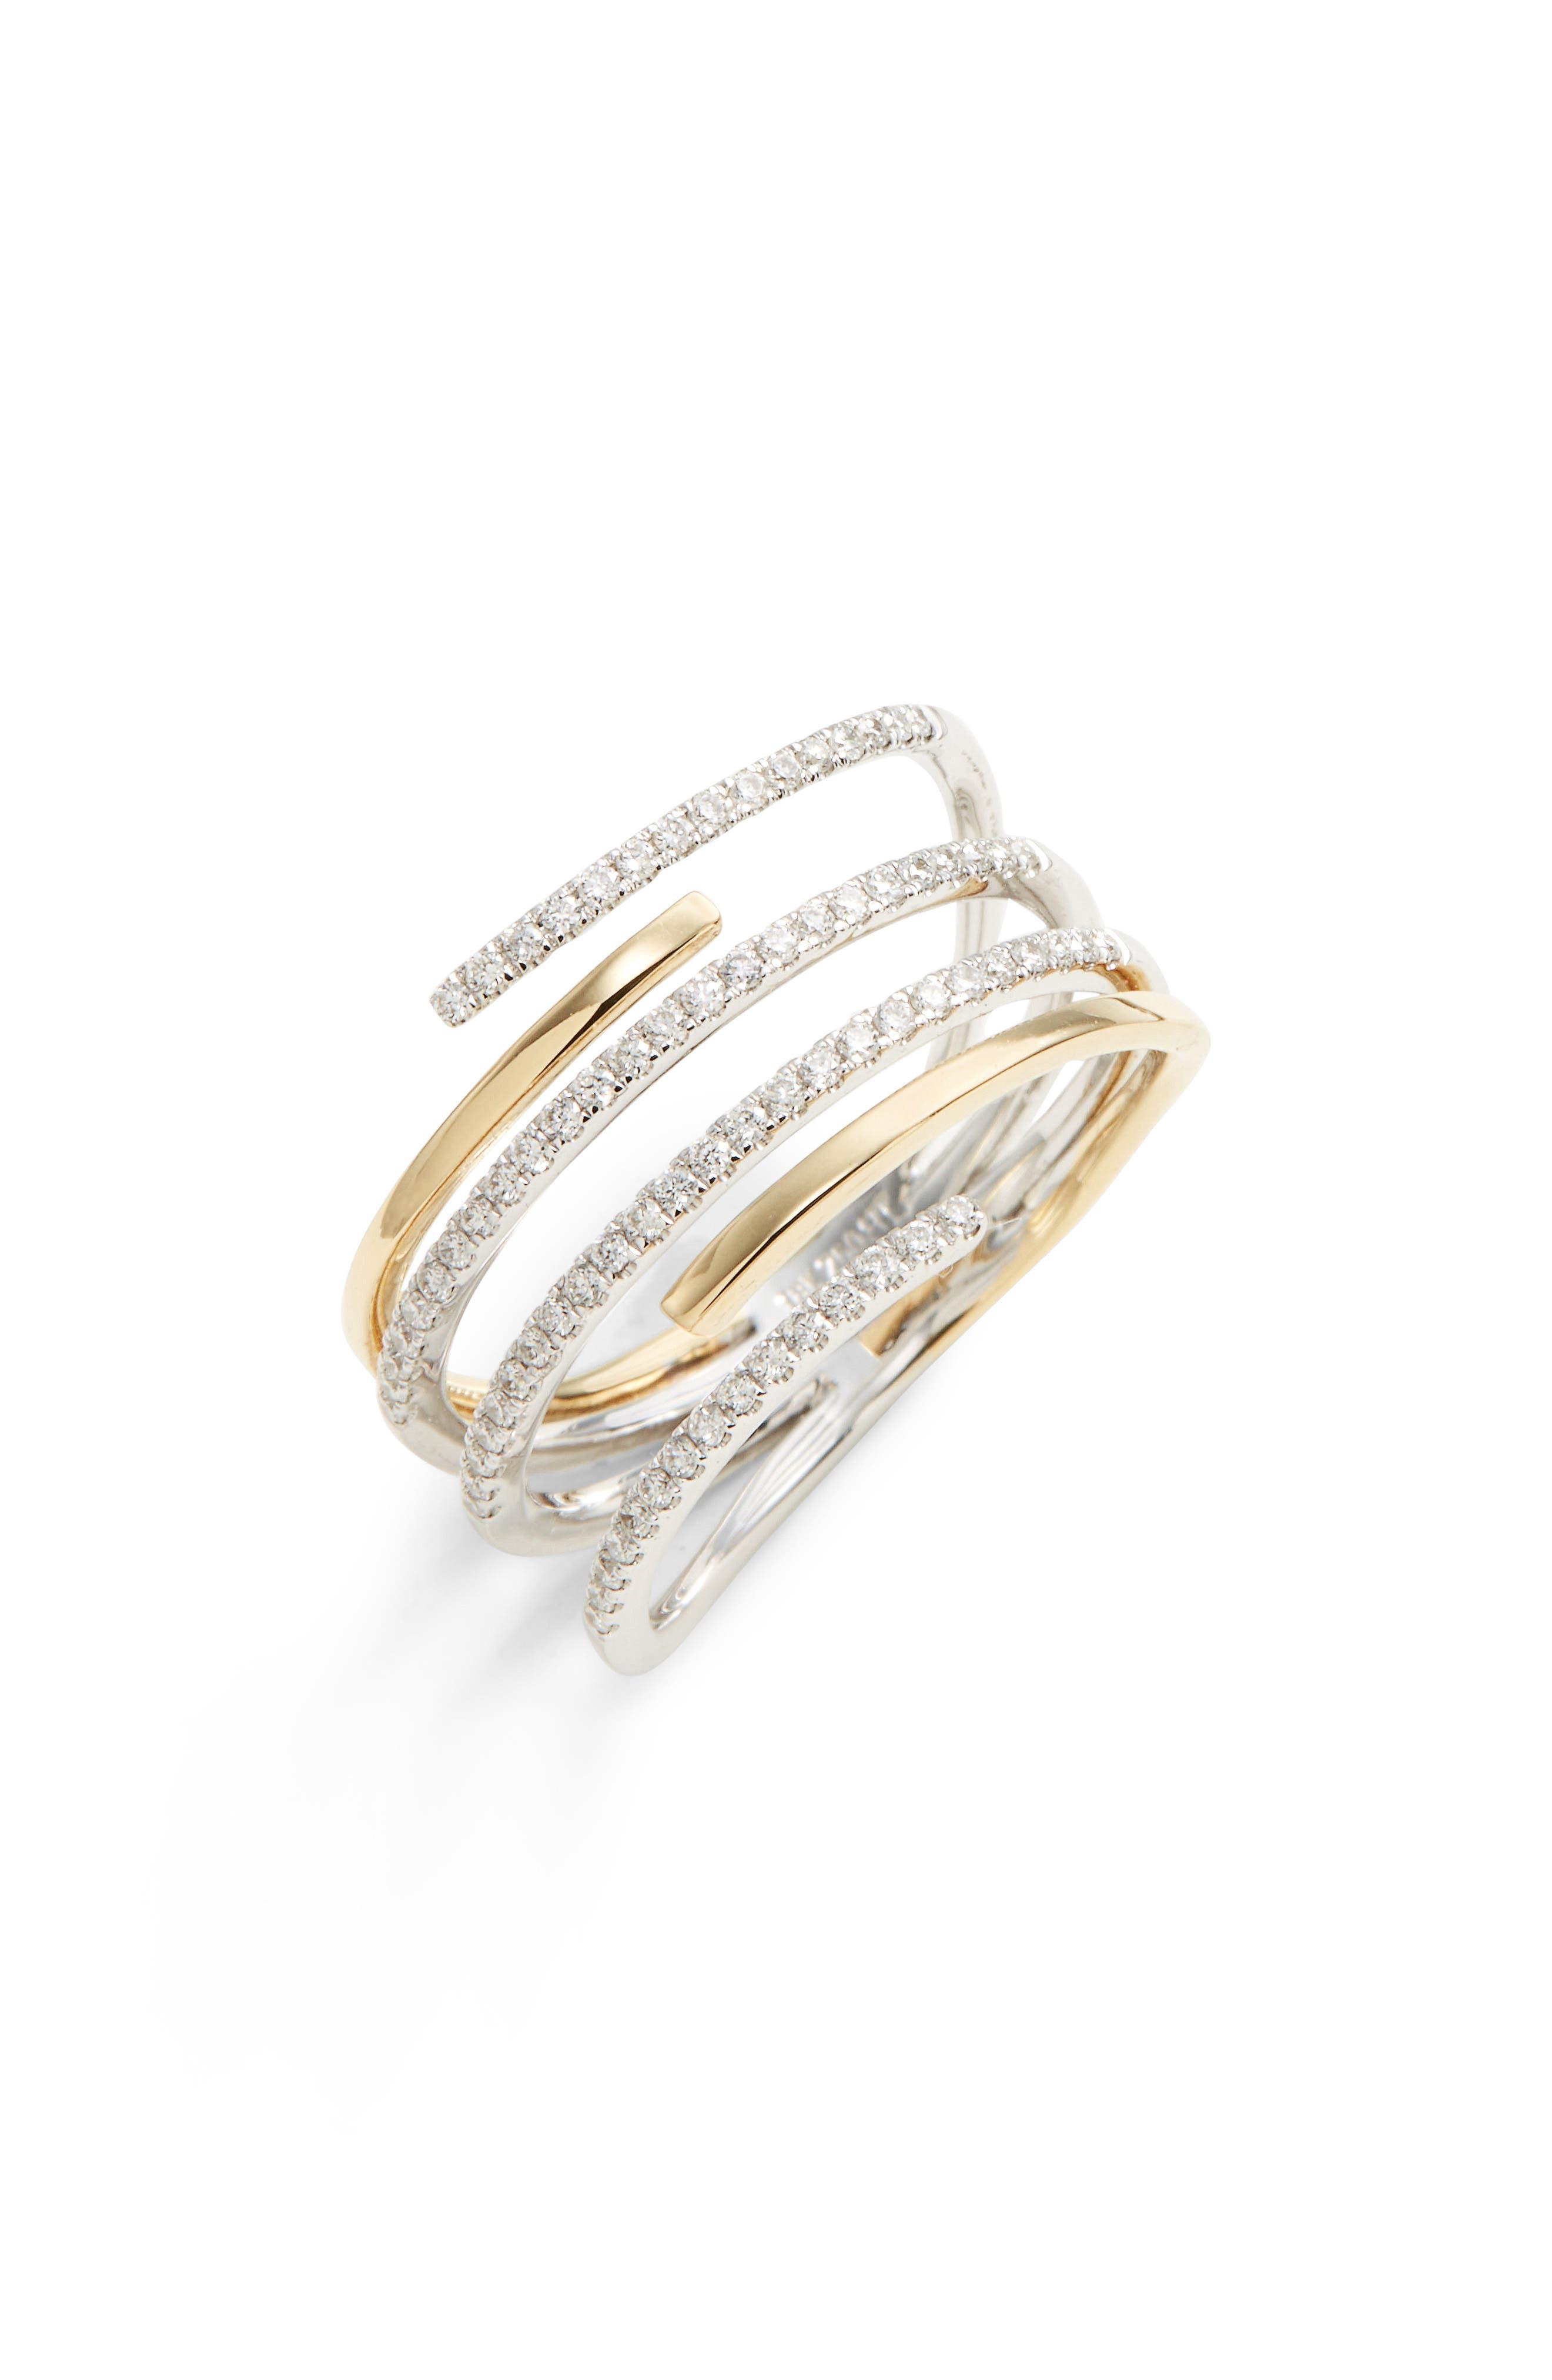 Main Image - Bony Levy Openwork Diamond Ring (Nordstrom Exclusive)